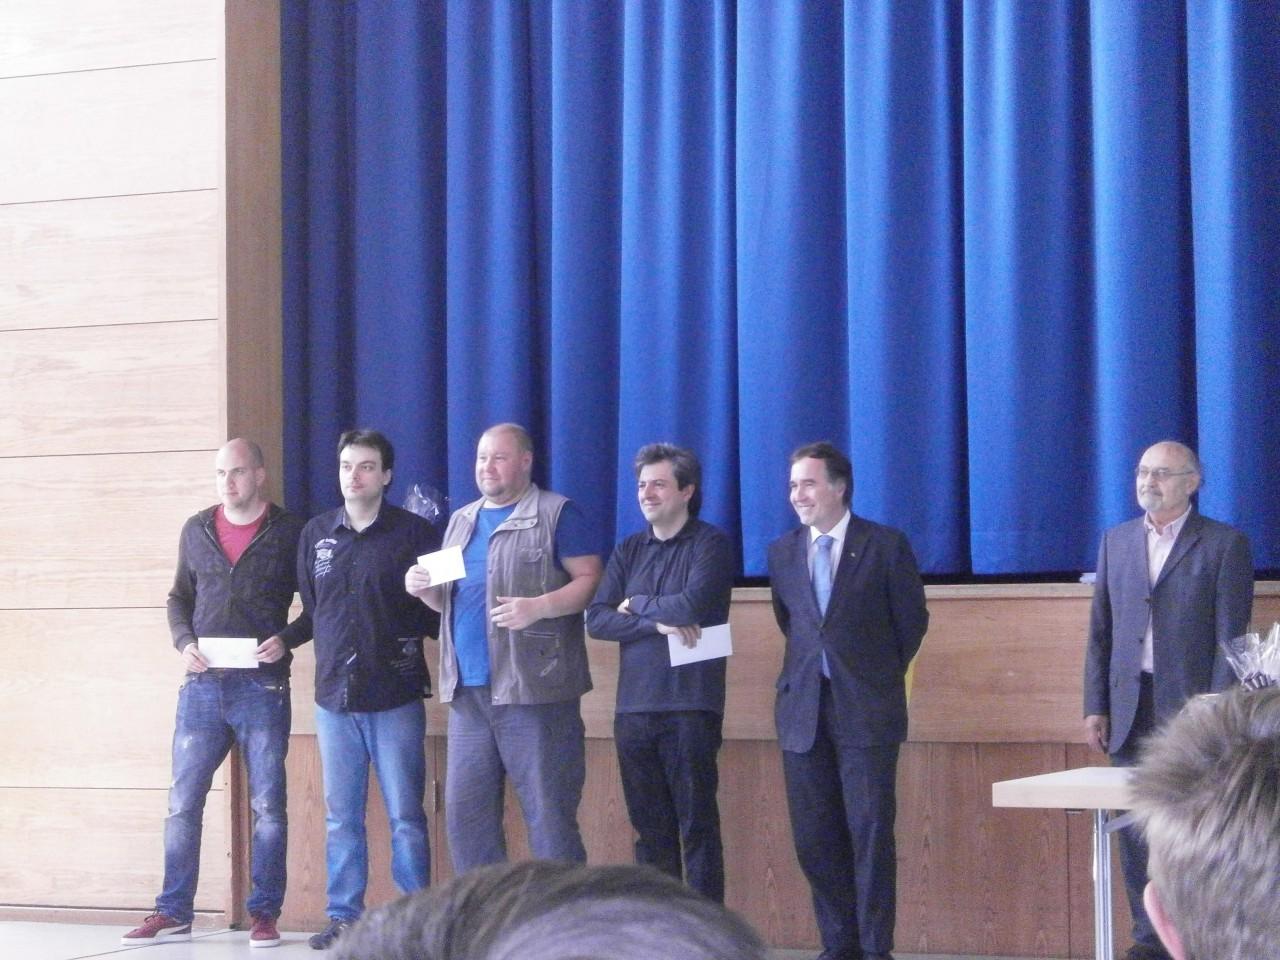 v.l.n.r.: Marin Bosiocic,Alexander Dgebuadze, Aleksandr Karpatchev,Alexander Belezky, Turnierleiter Michael Meier